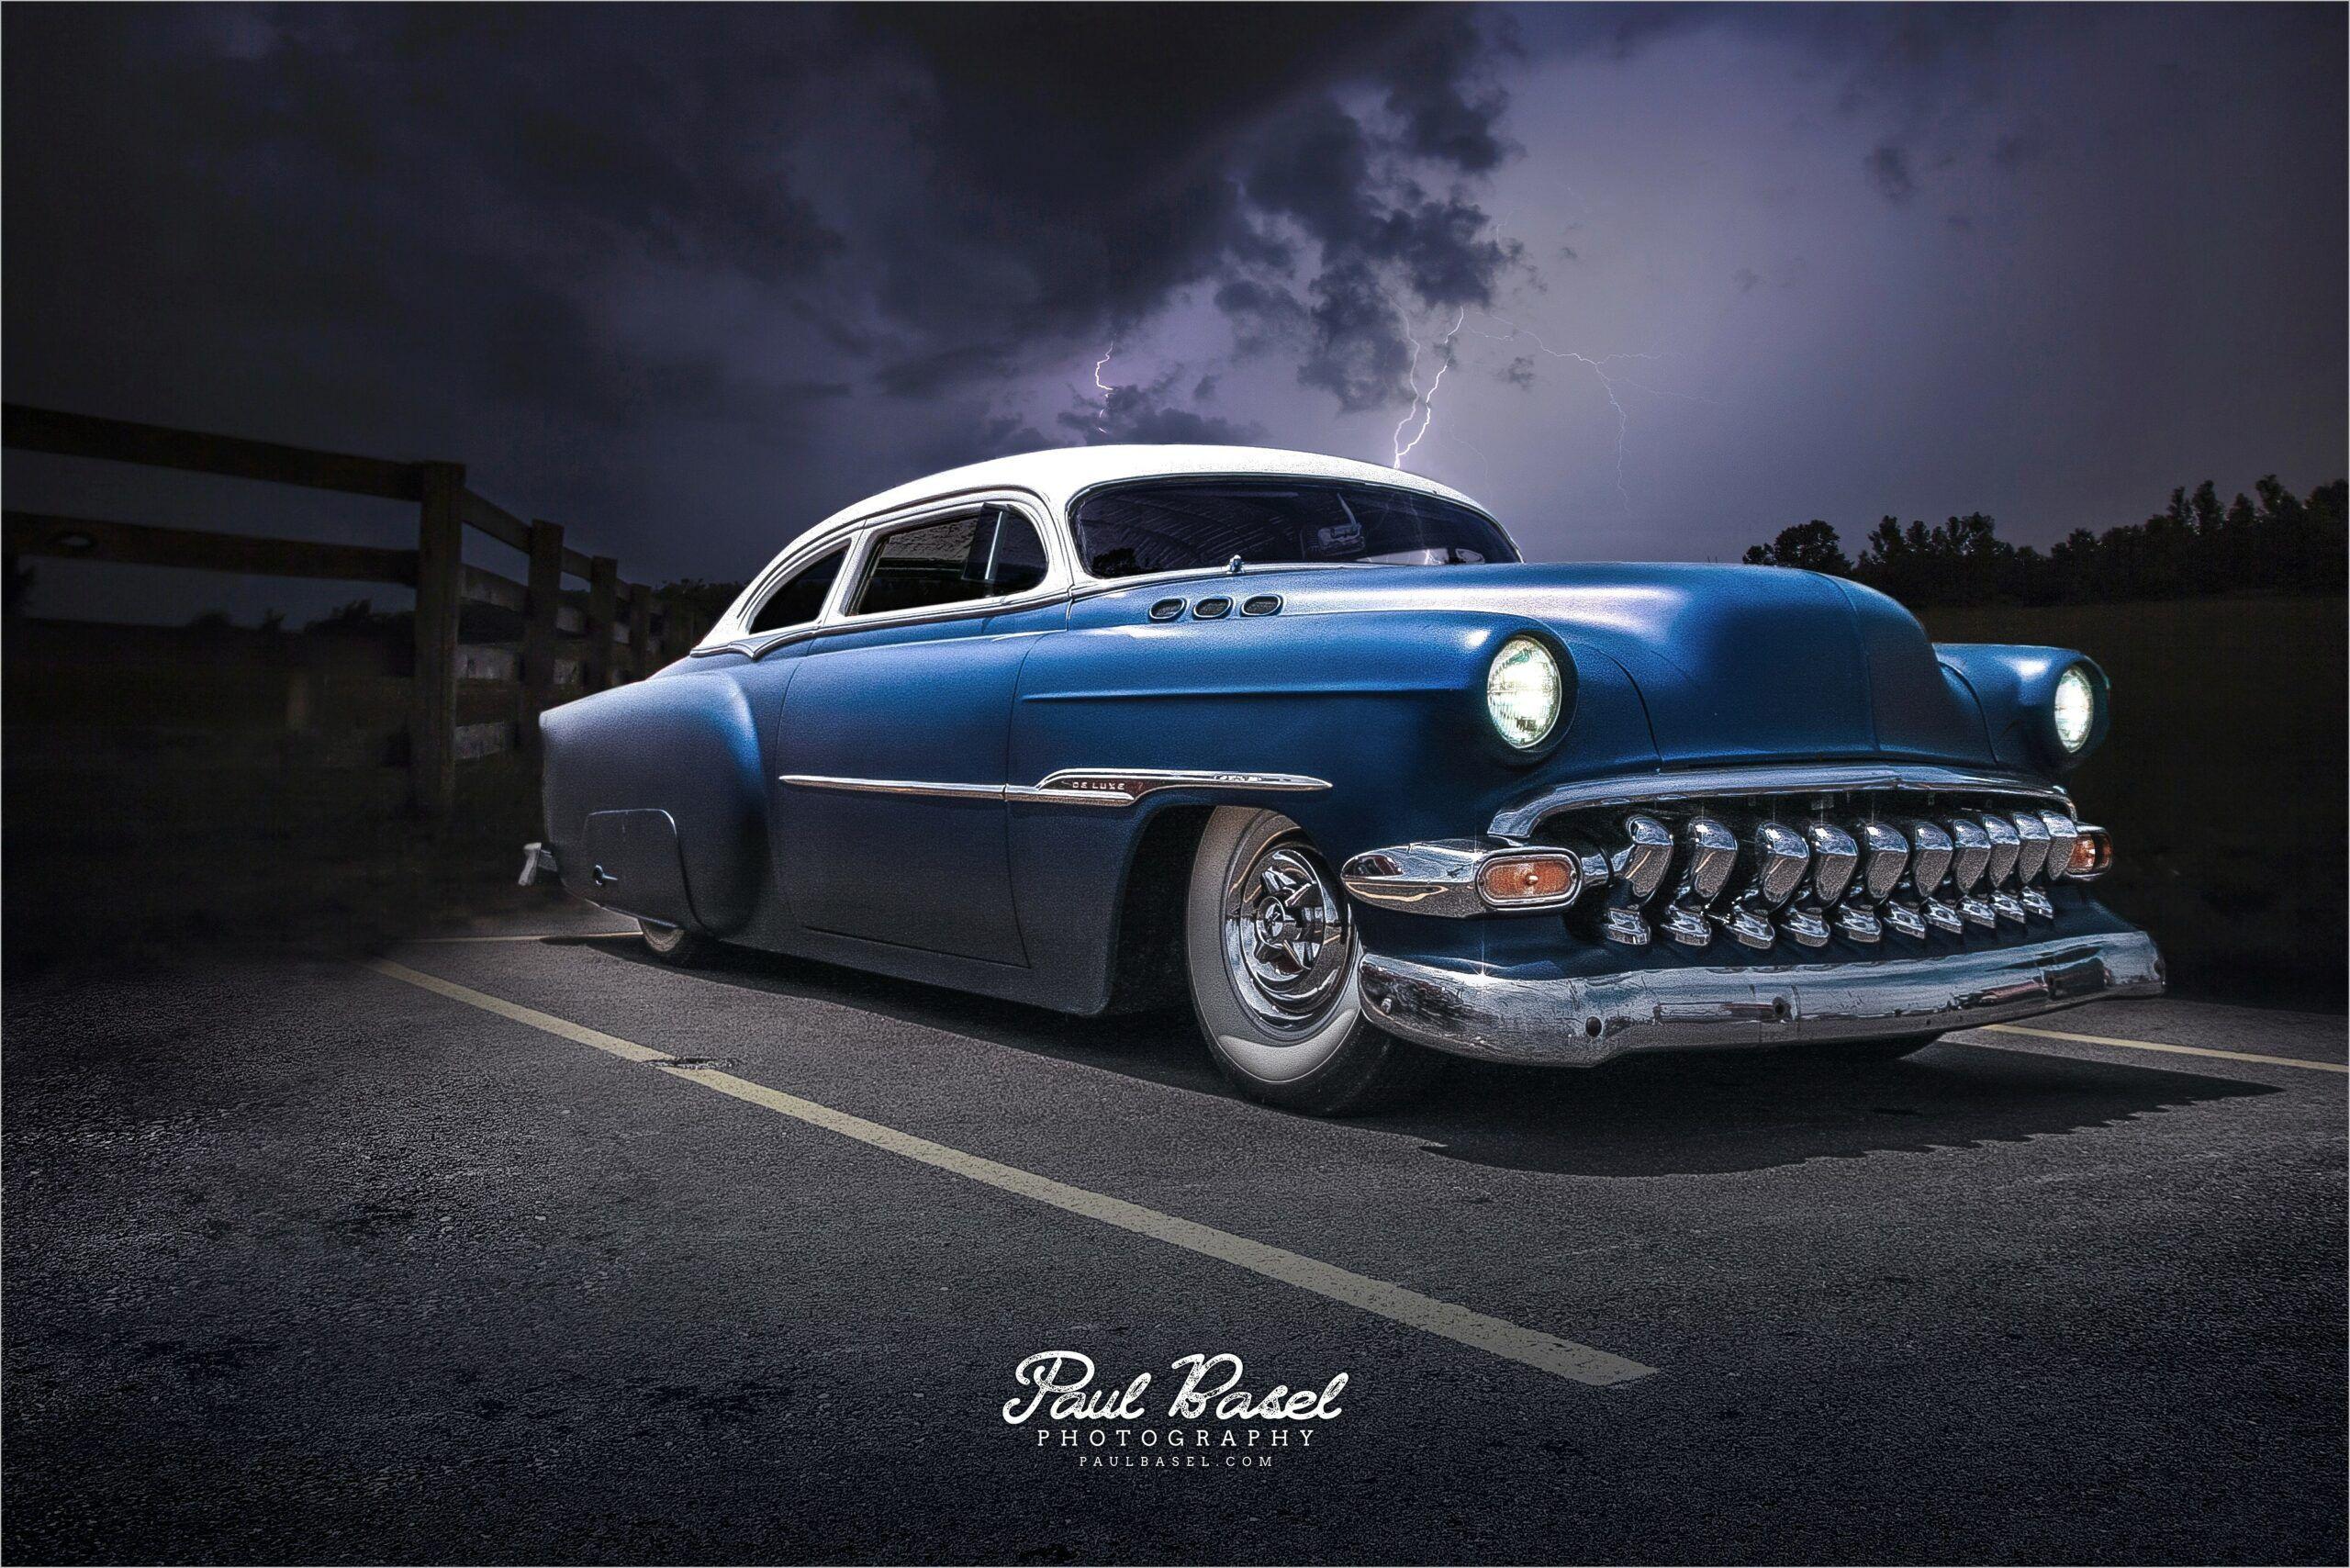 Classic Cars Wallpapers 4k Car Wallpapers Classic Cars Wallpaper